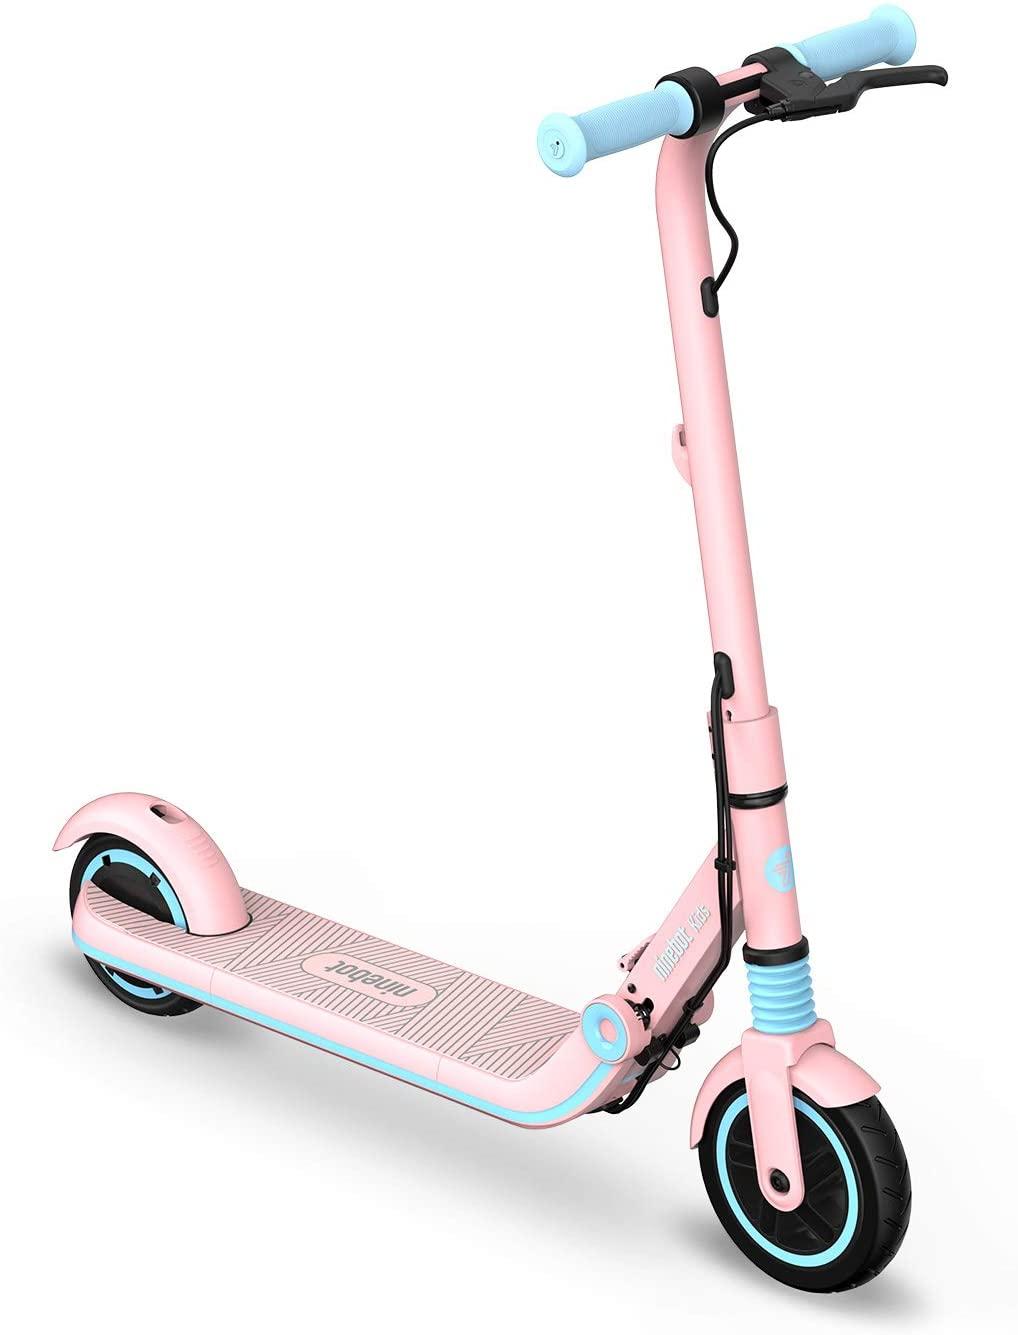 Segway Ninebot E8 Electric Kick Scooter (Pink) $169.99 + FS